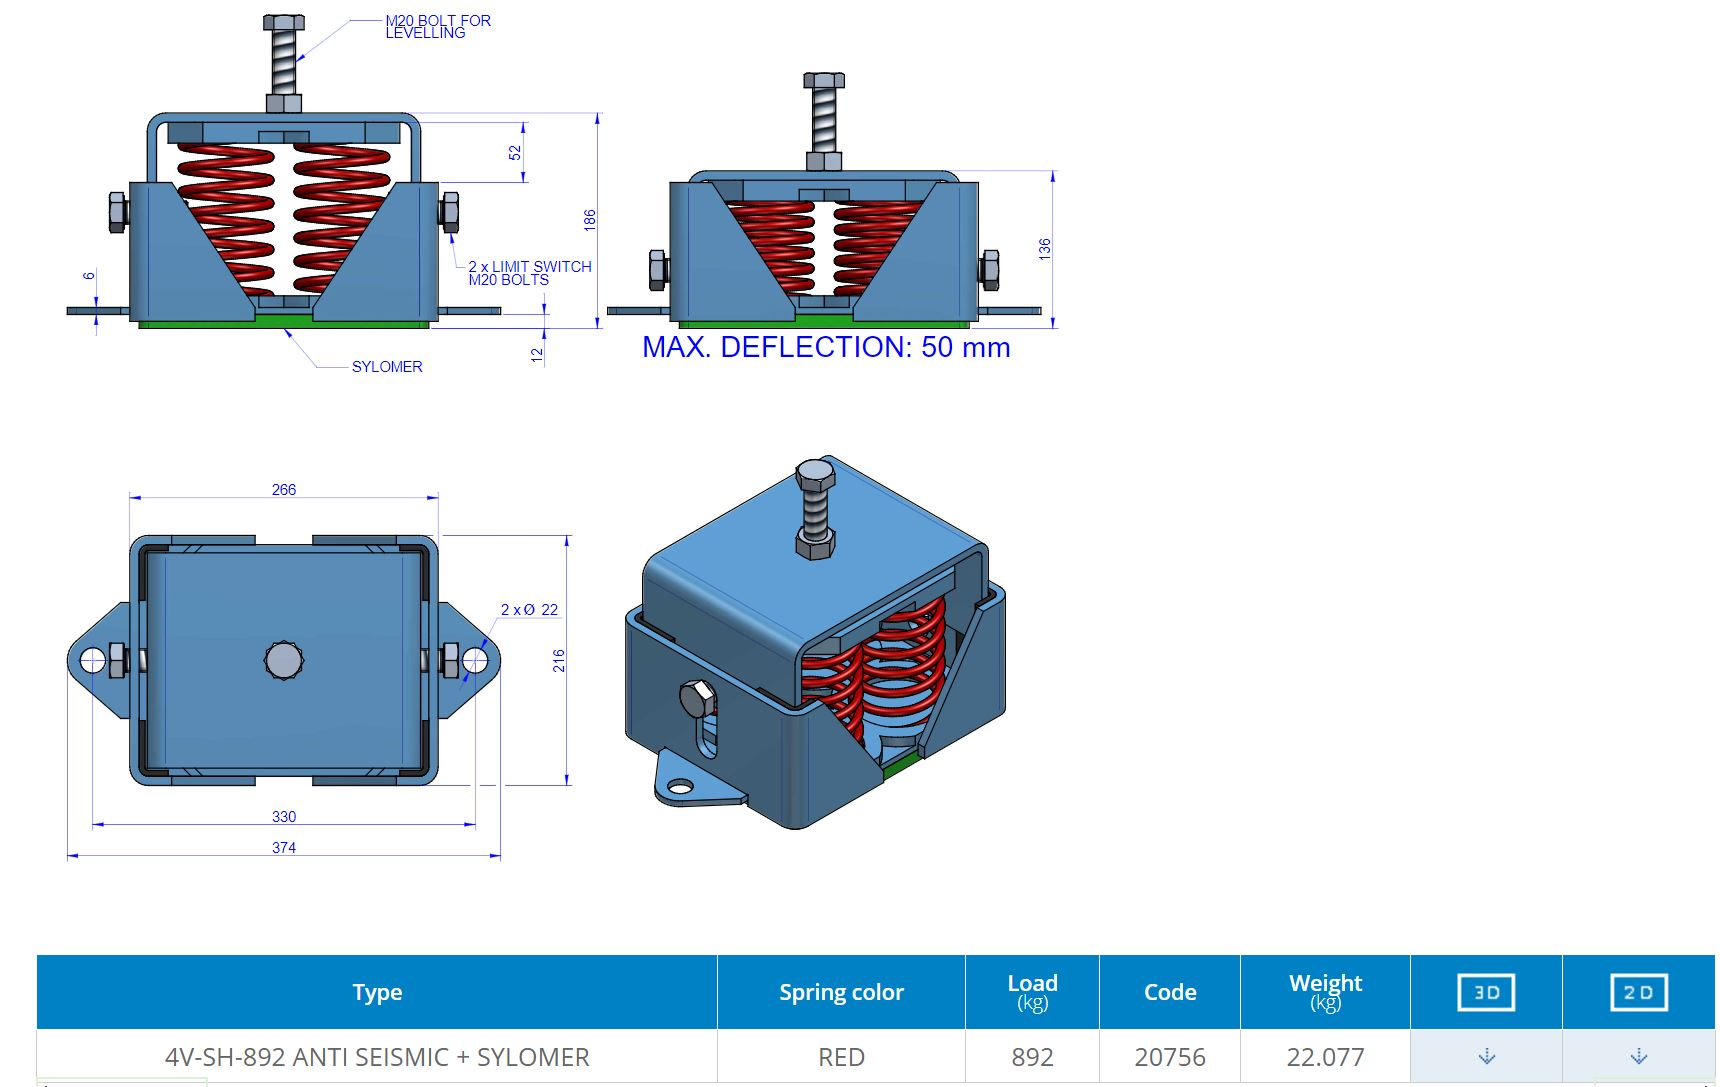 4V-SH-892 Anti Seismic + sylomer